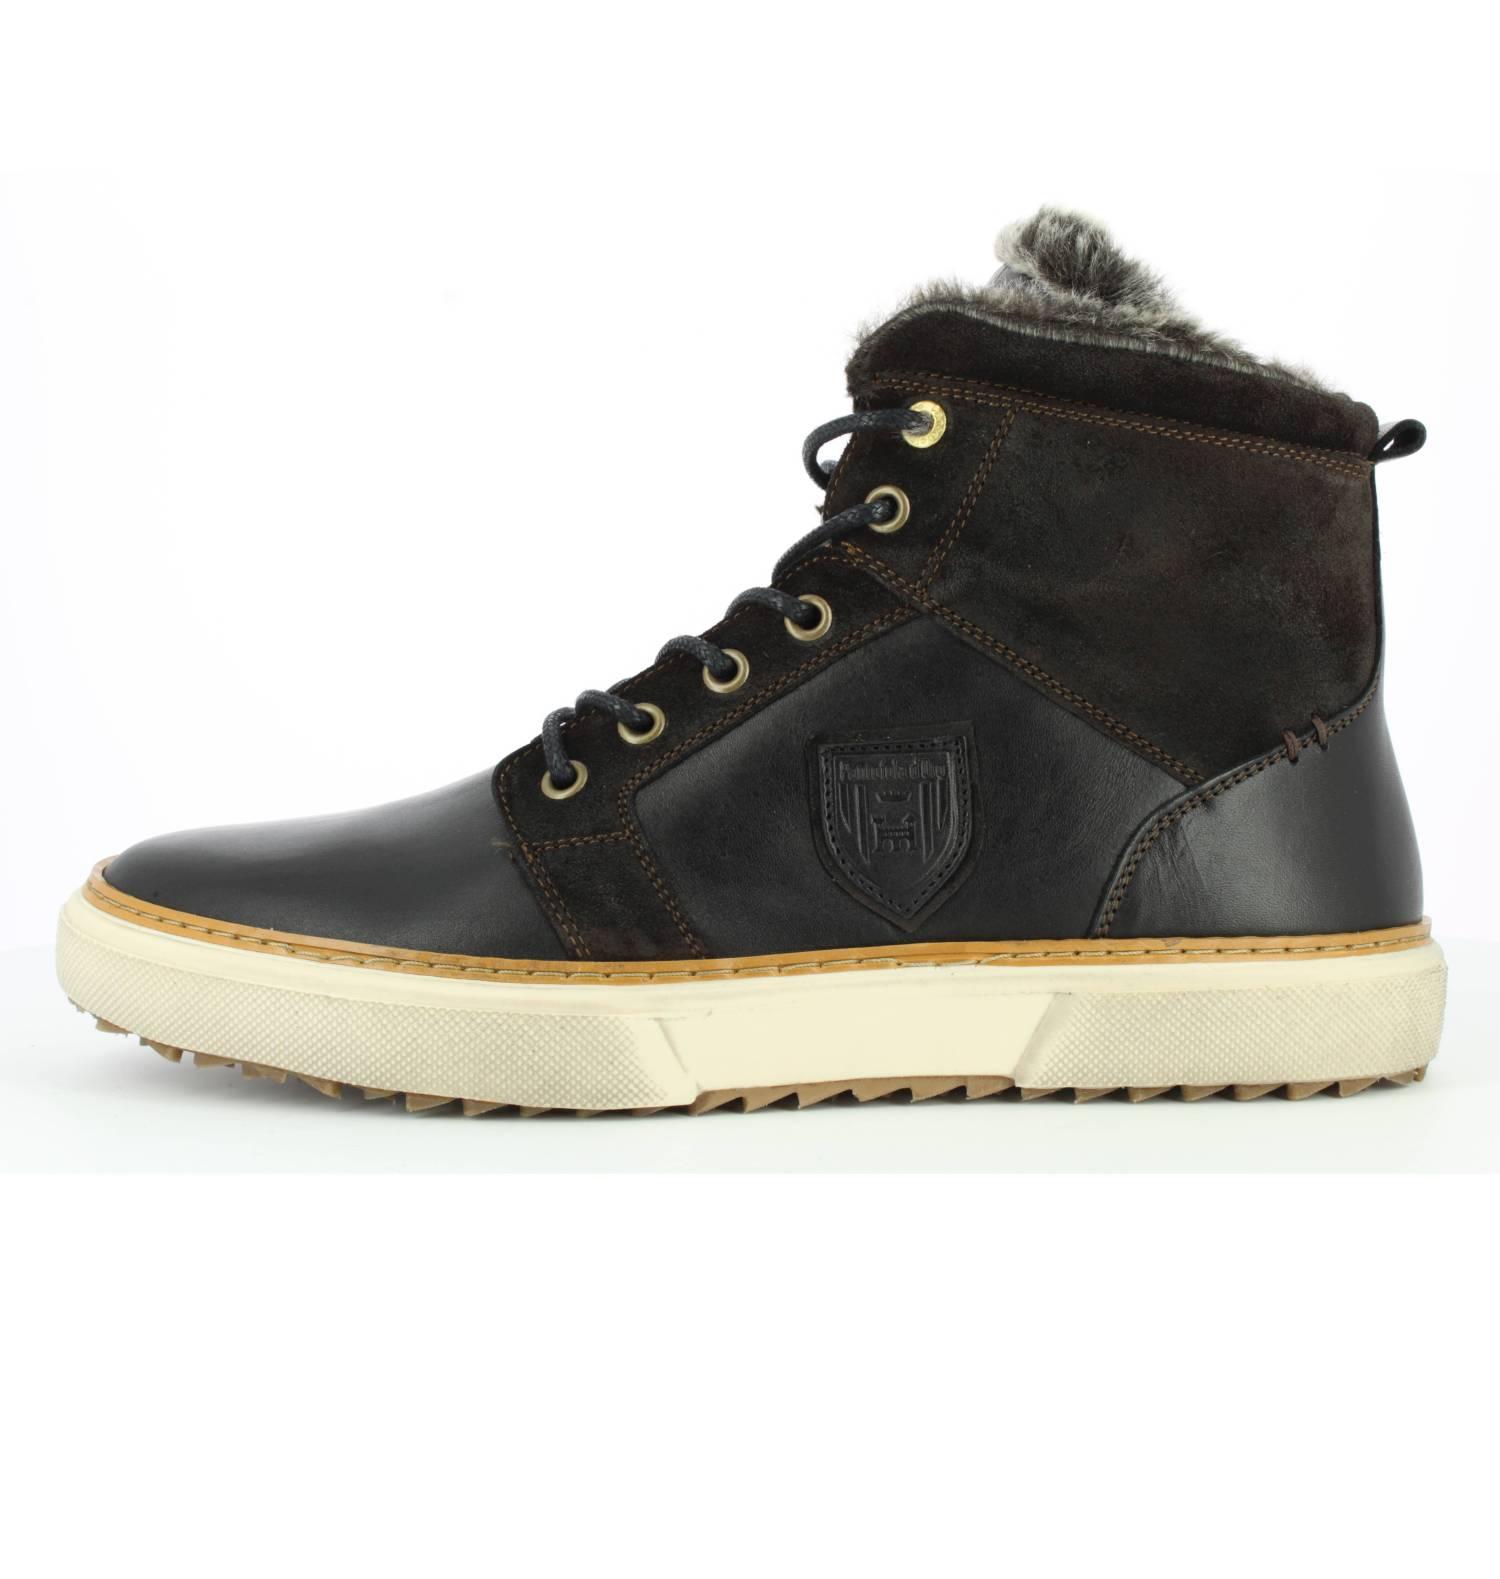 Pantofola d'Oro Benevento Uomo Fur Mid braun Coffee Bean Low-Cut Sneaker Herren